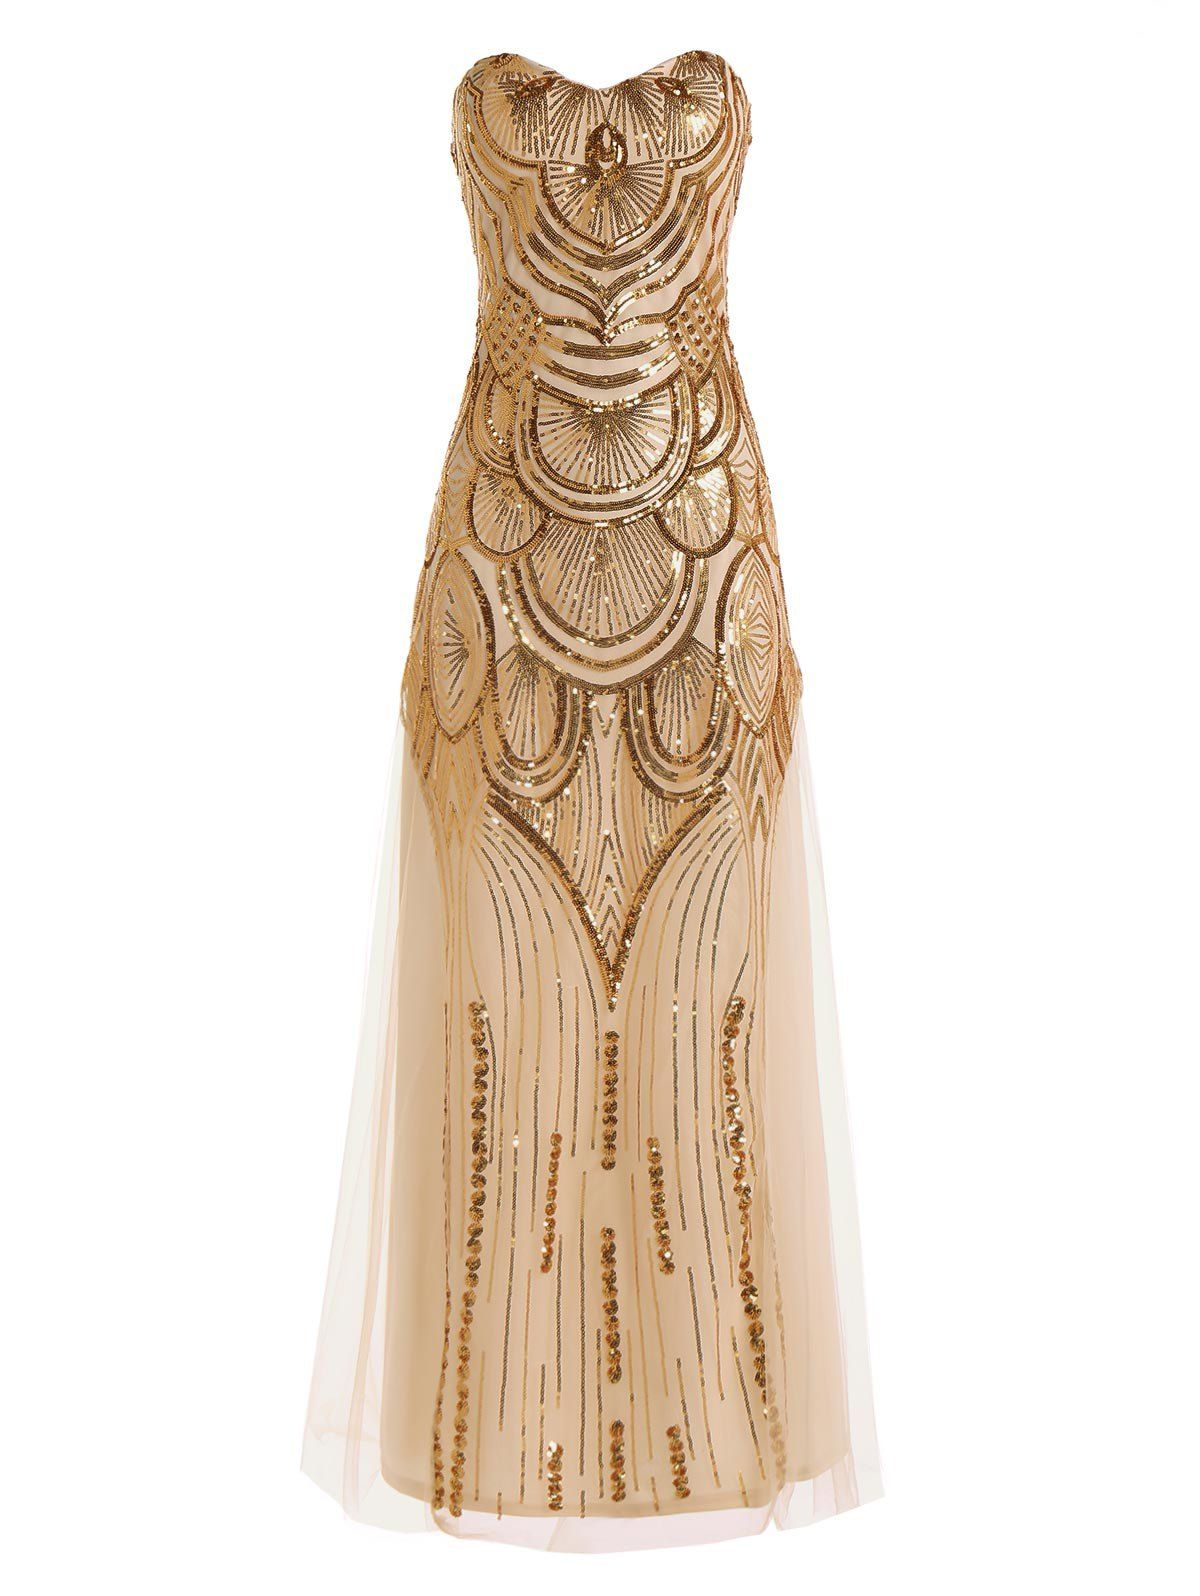 Strapless sequin glitter floor length formal party bridemaid dress